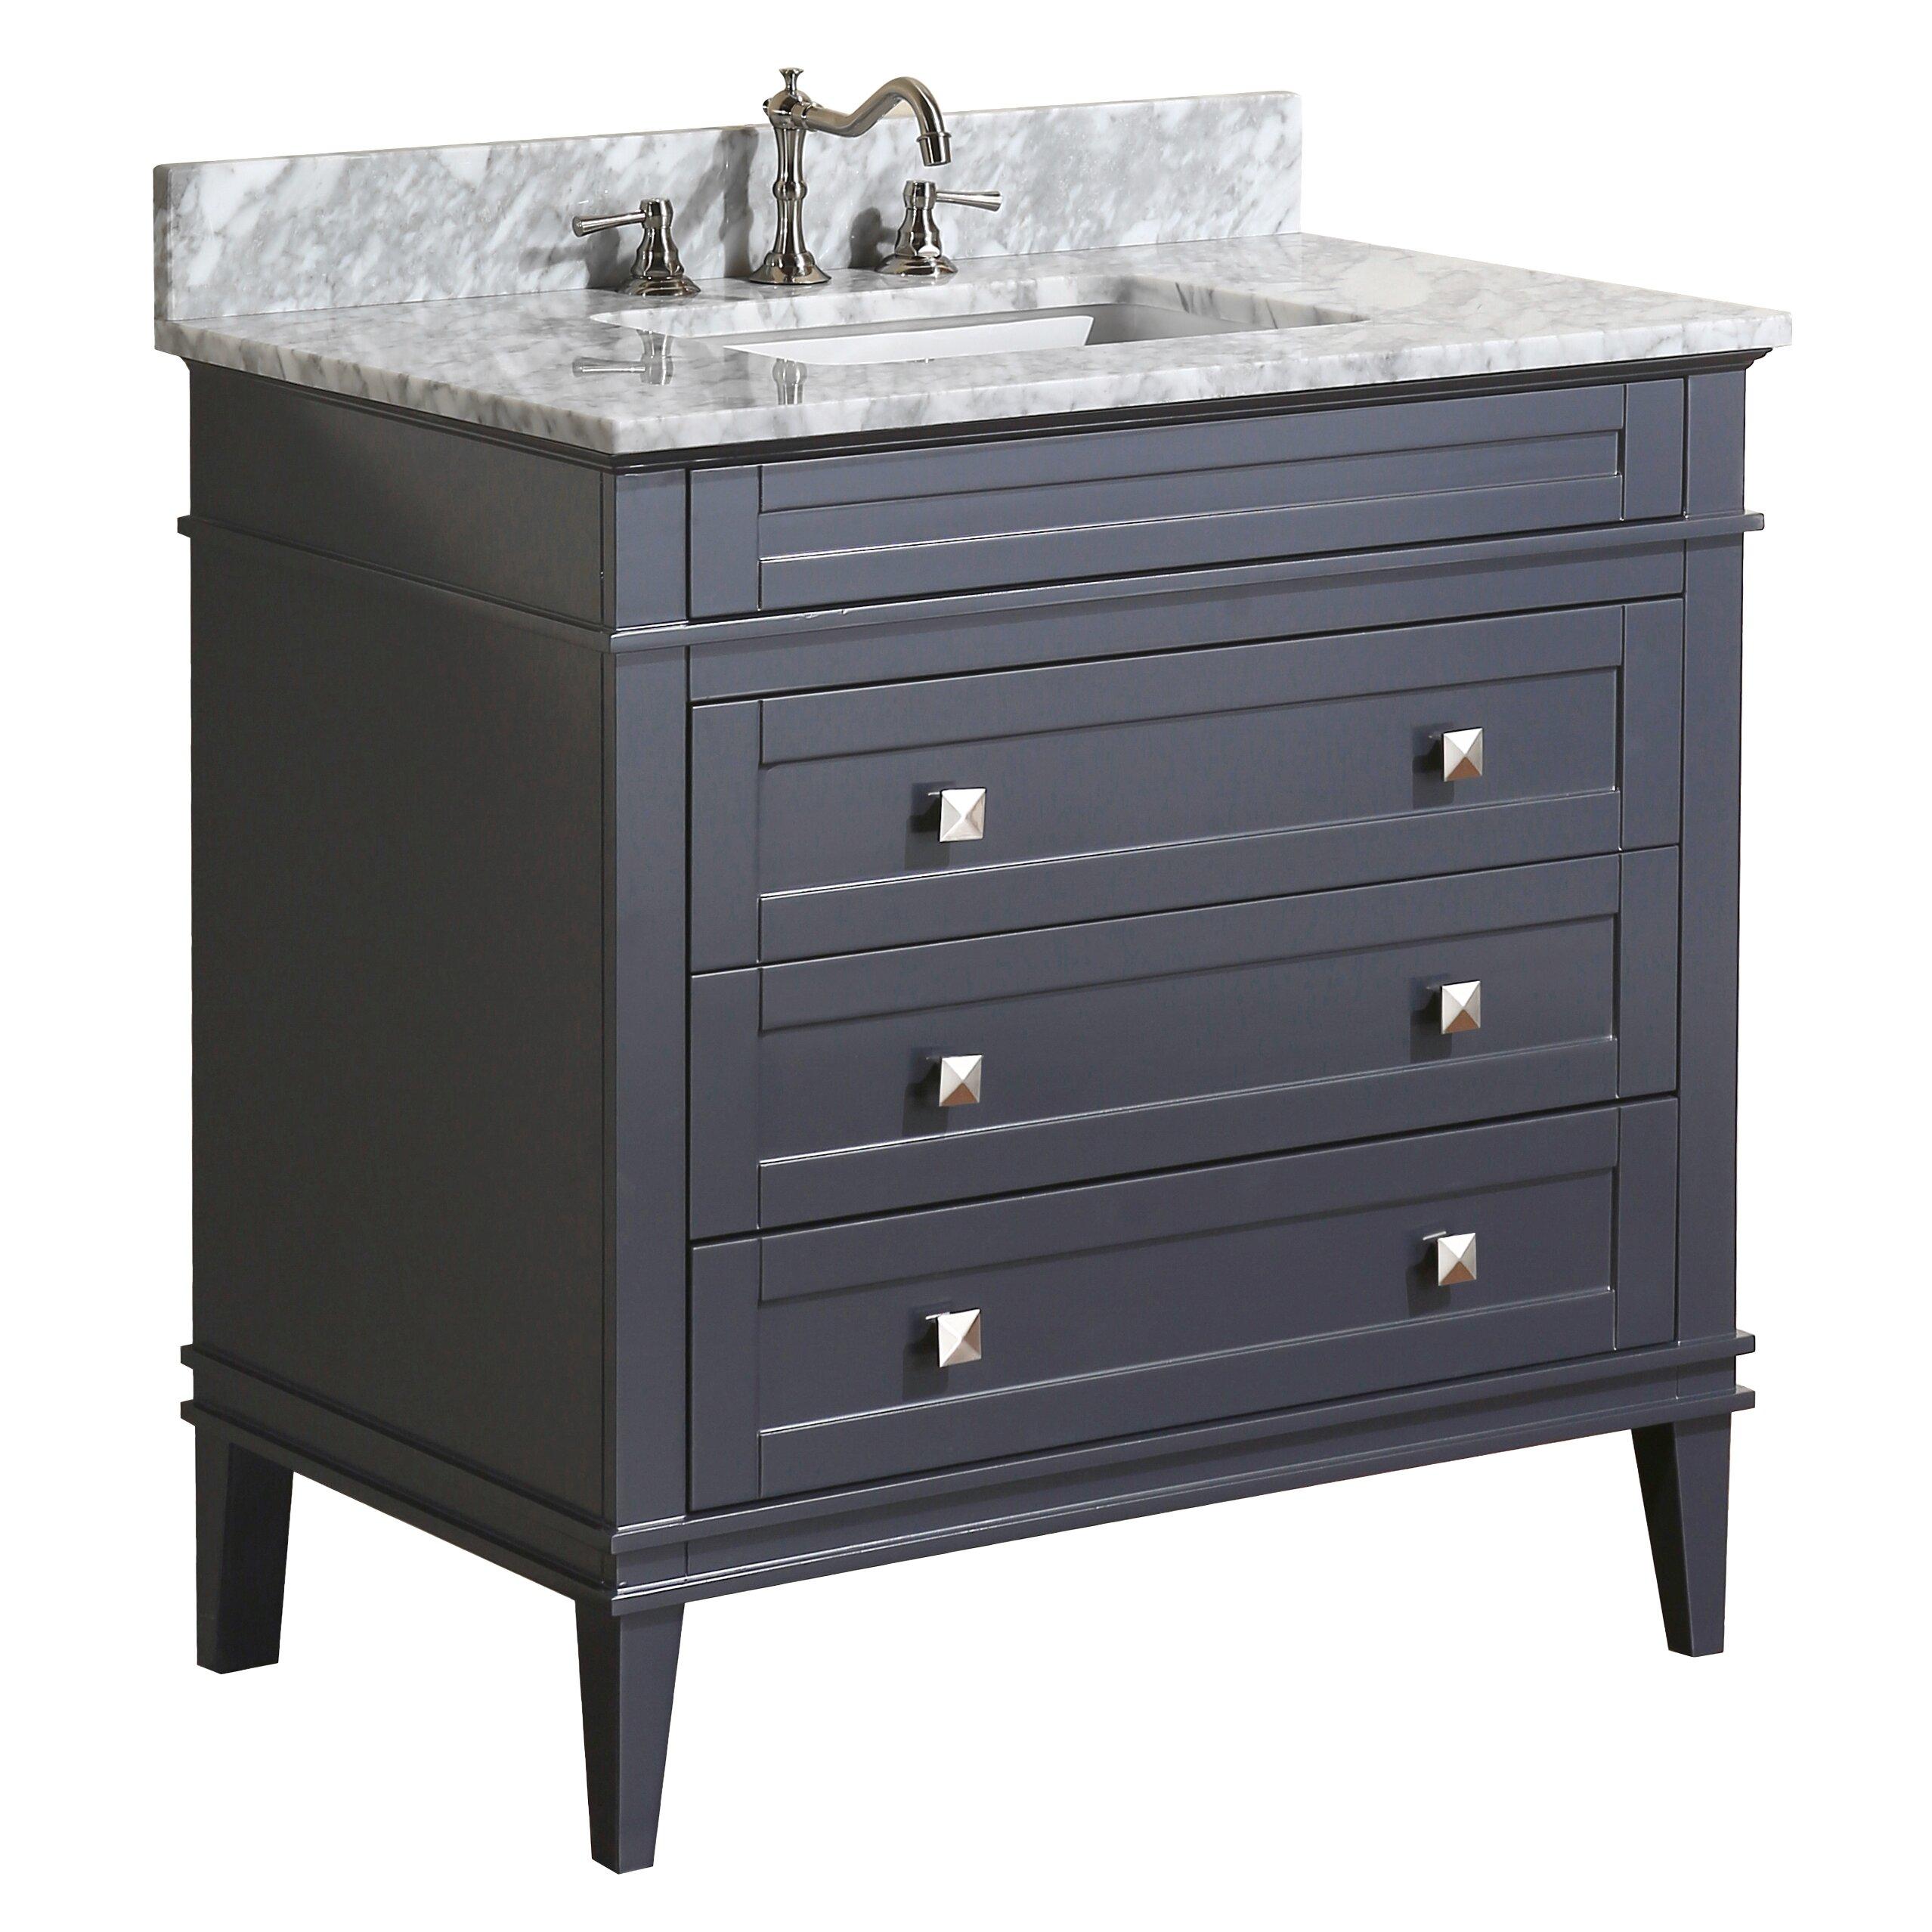 Kbc eleanor 36 single bathroom vanity set reviews wayfair for Kitchen bath cabinets